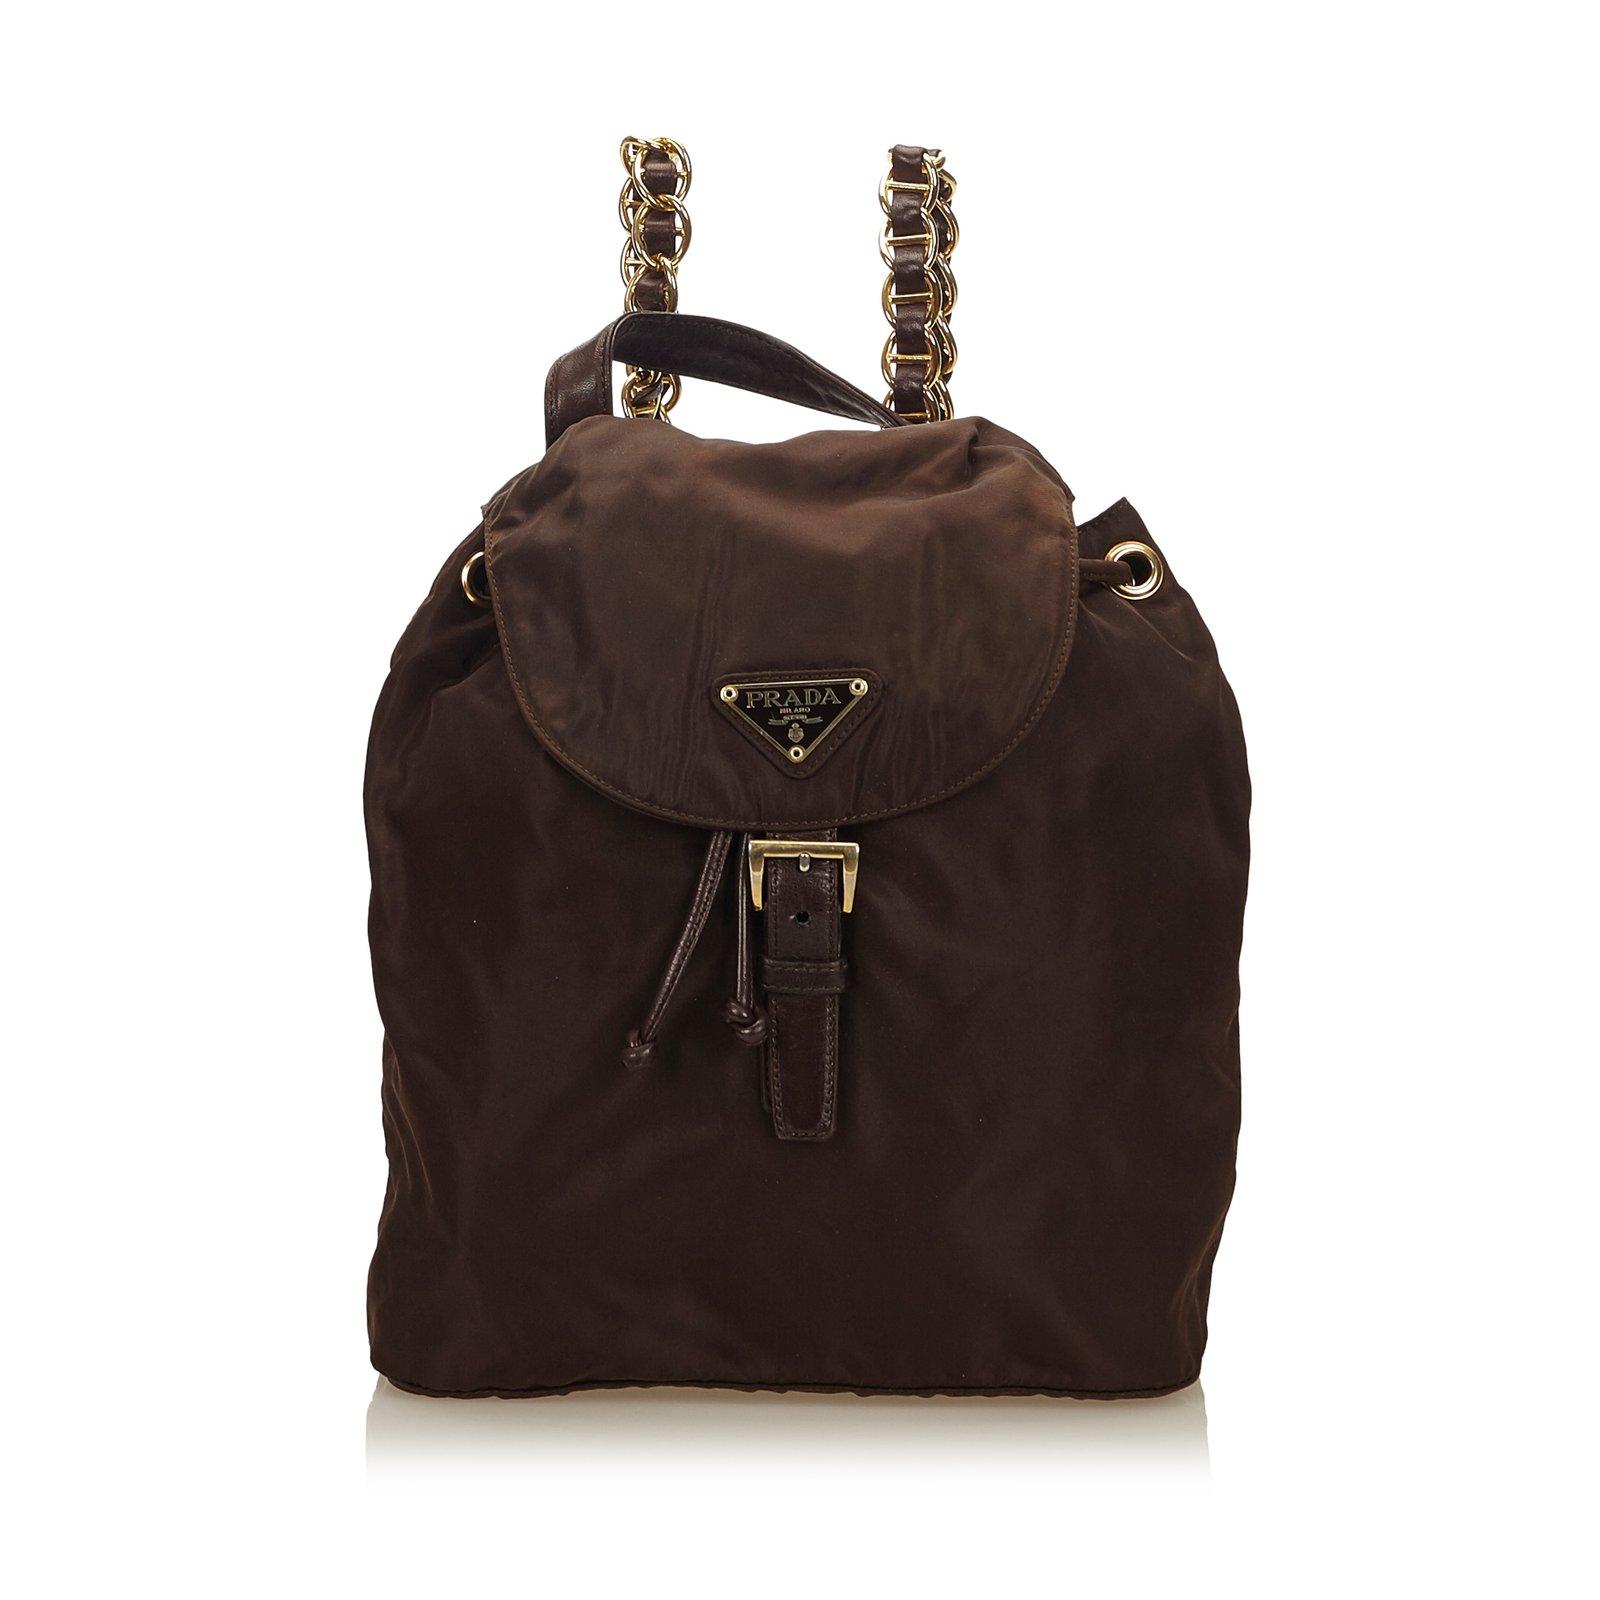 3b75920b5de8 ... coupon for prada nylon chain drawstring backpack backpacks  leatherothernyloncloth browndark ee914 176d3